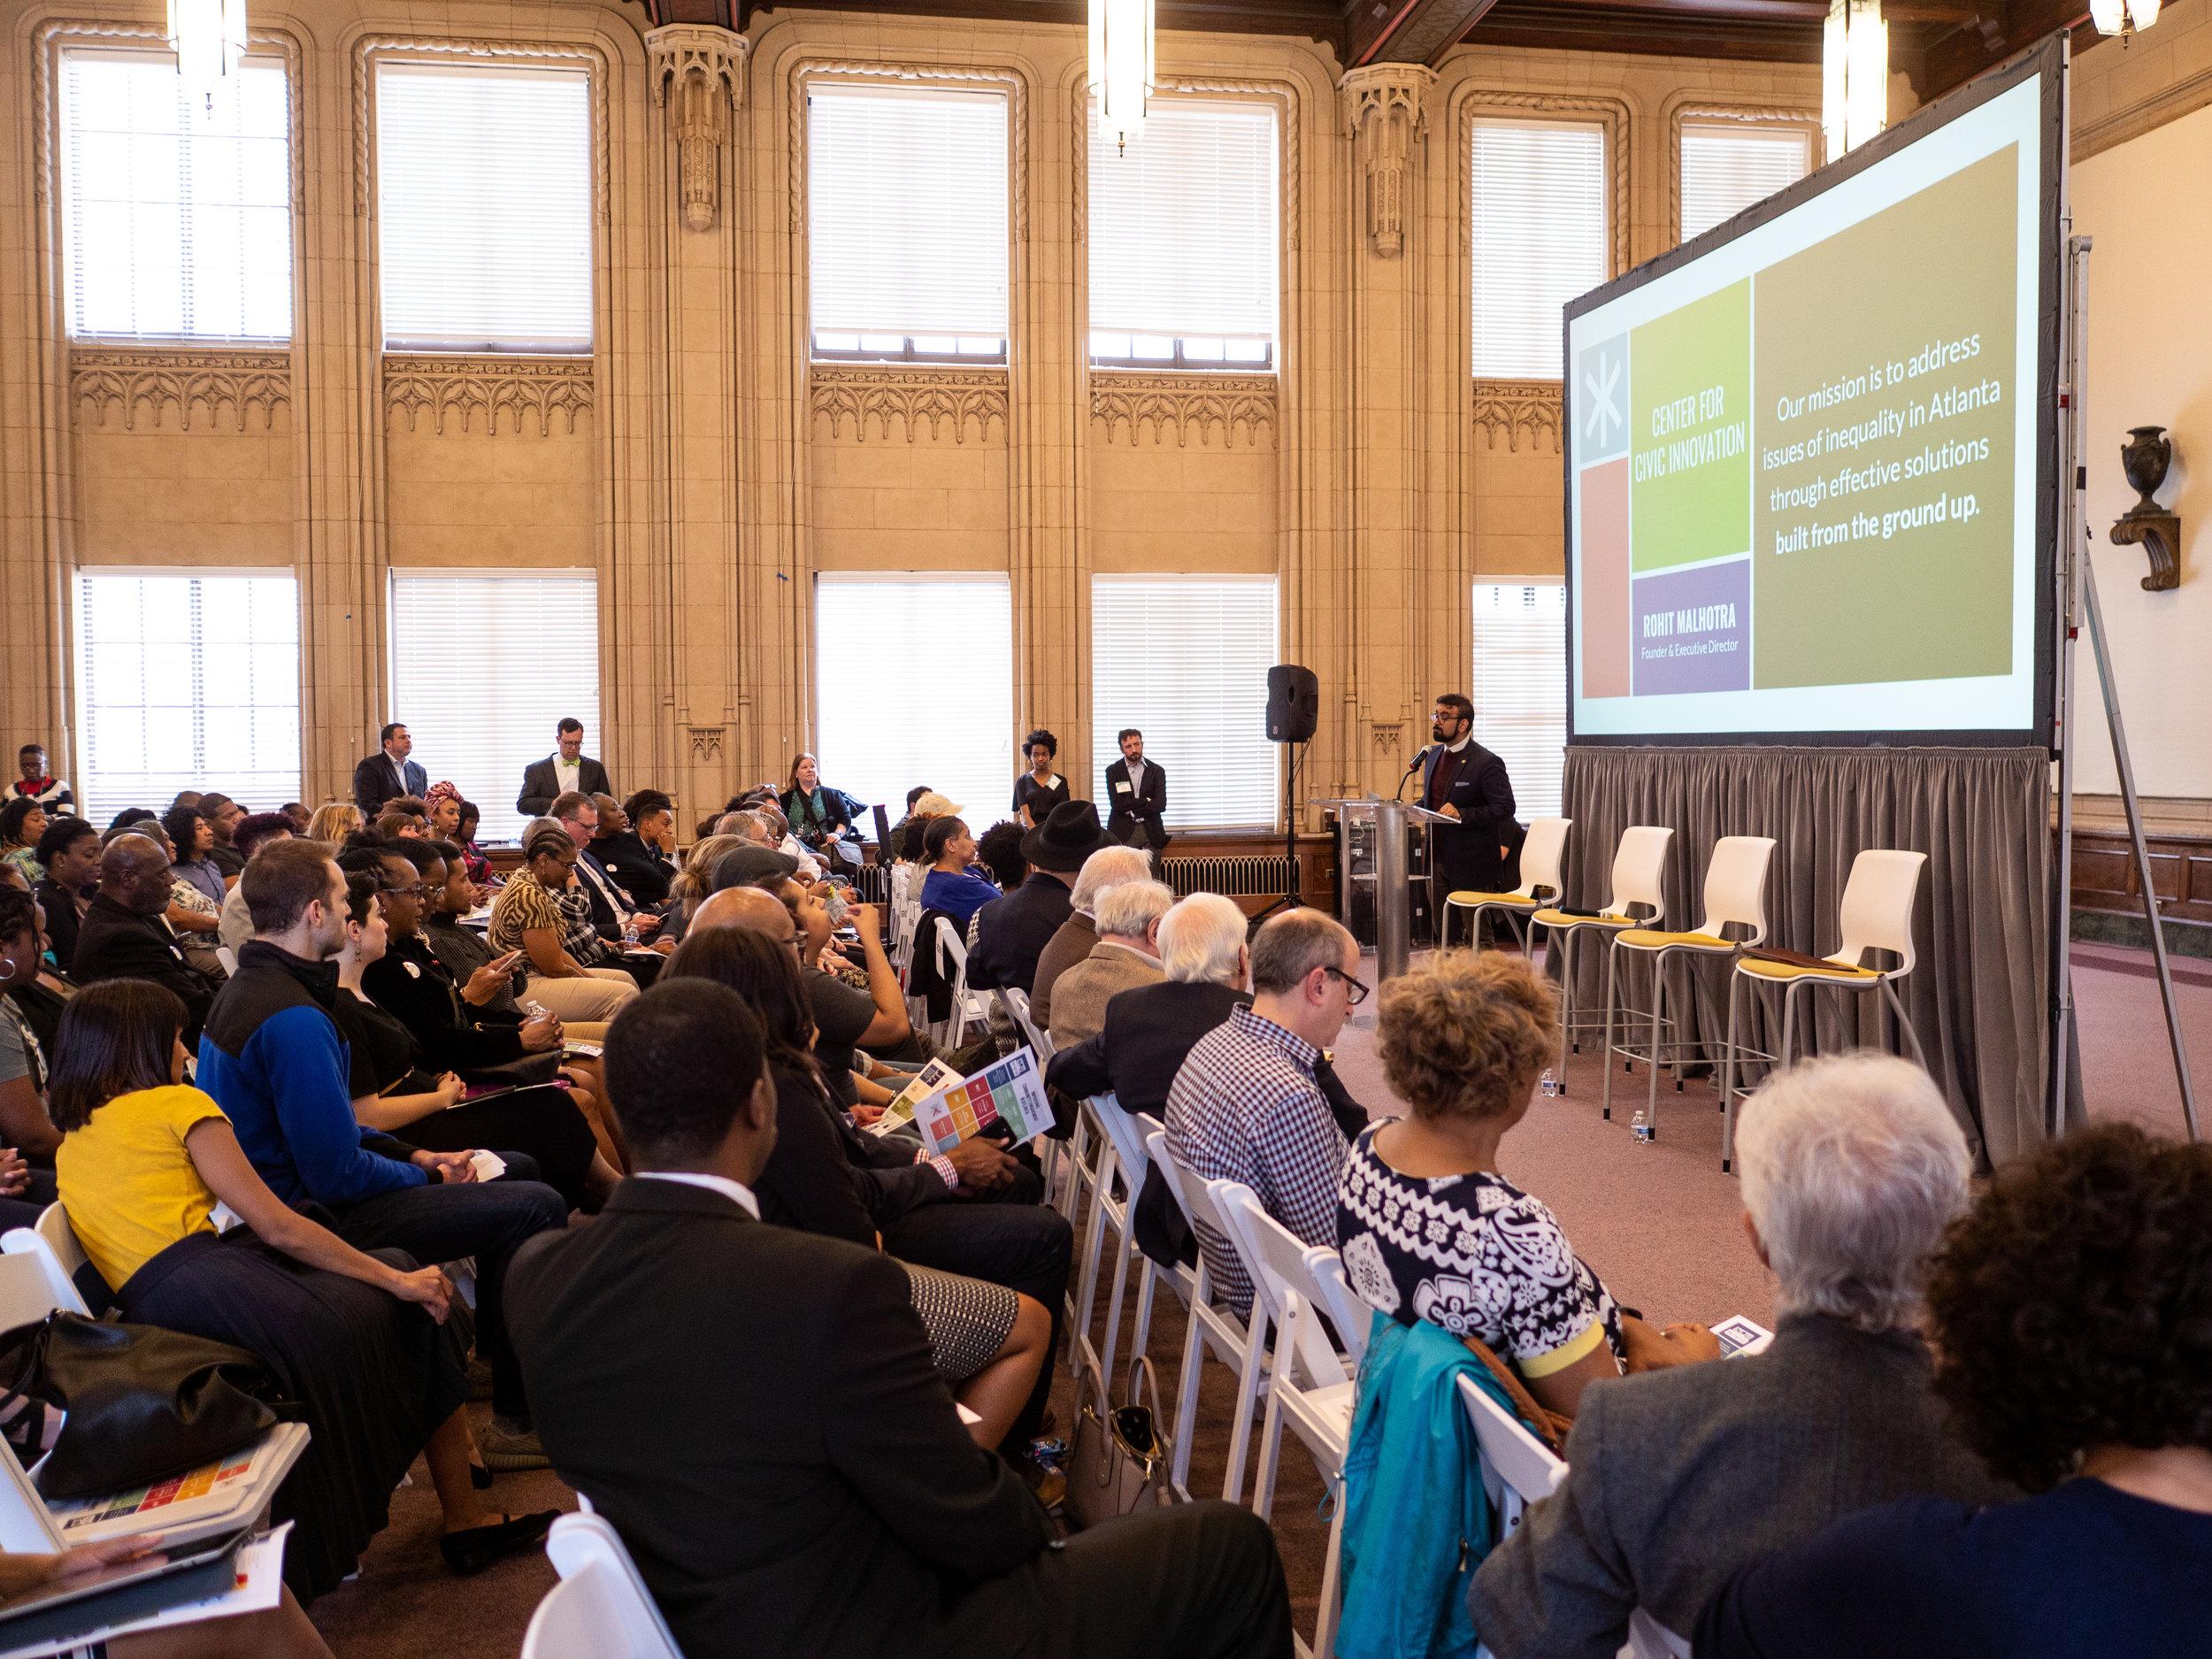 NPU Initiative - IMPROVING COMMUNITY ENGAGEMENT IN ATLANTA